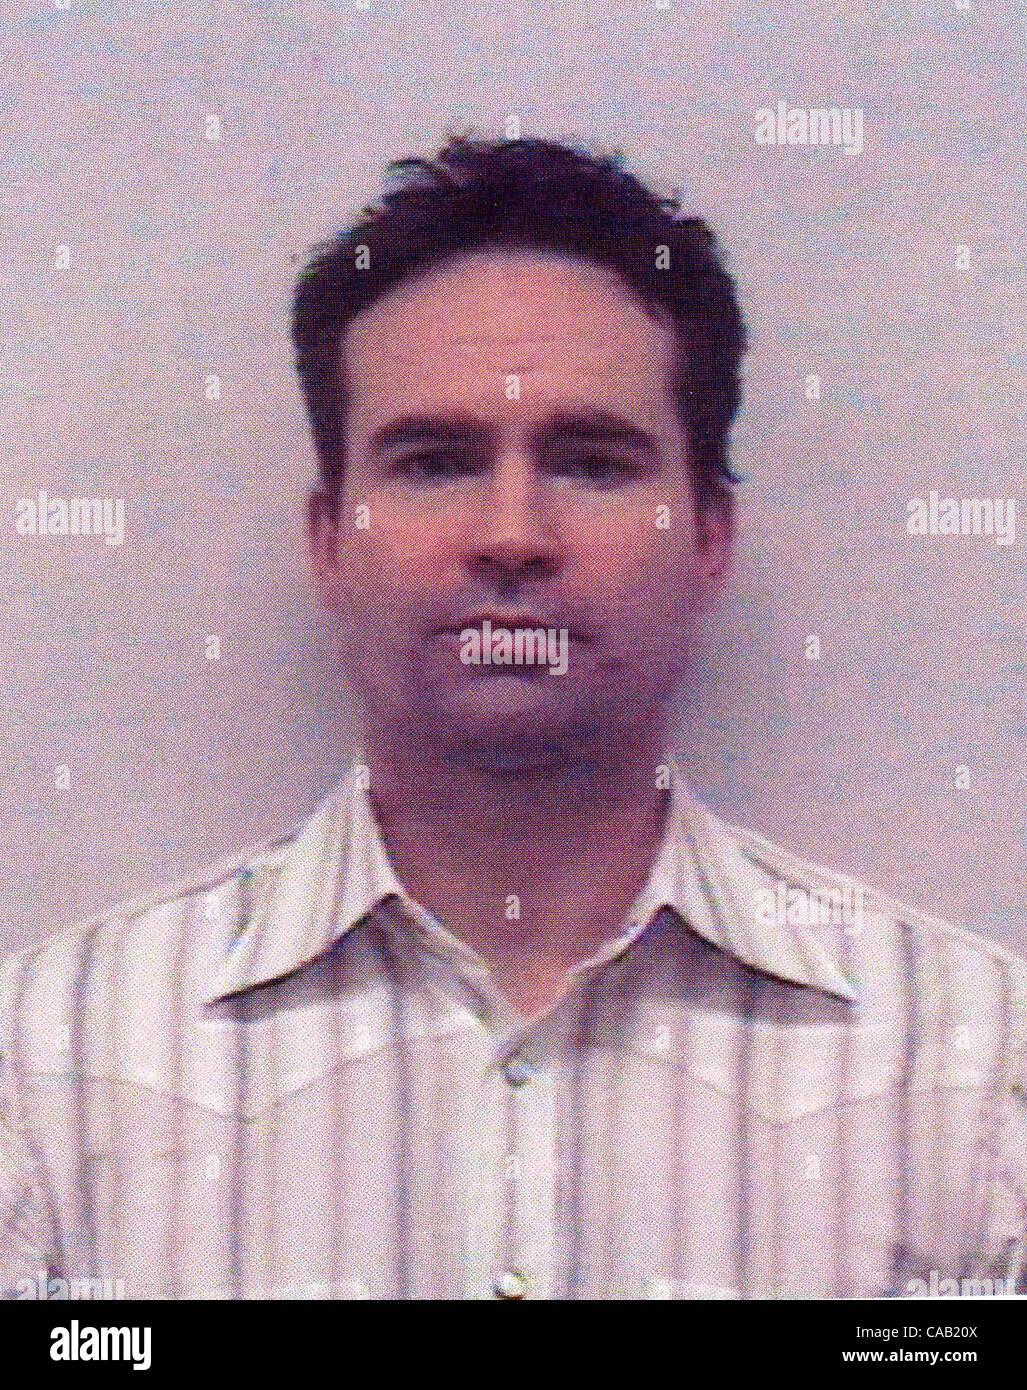 Mar 30, 2004 - Austin, TX, USA - Actor JASON PATRIC spent five hours